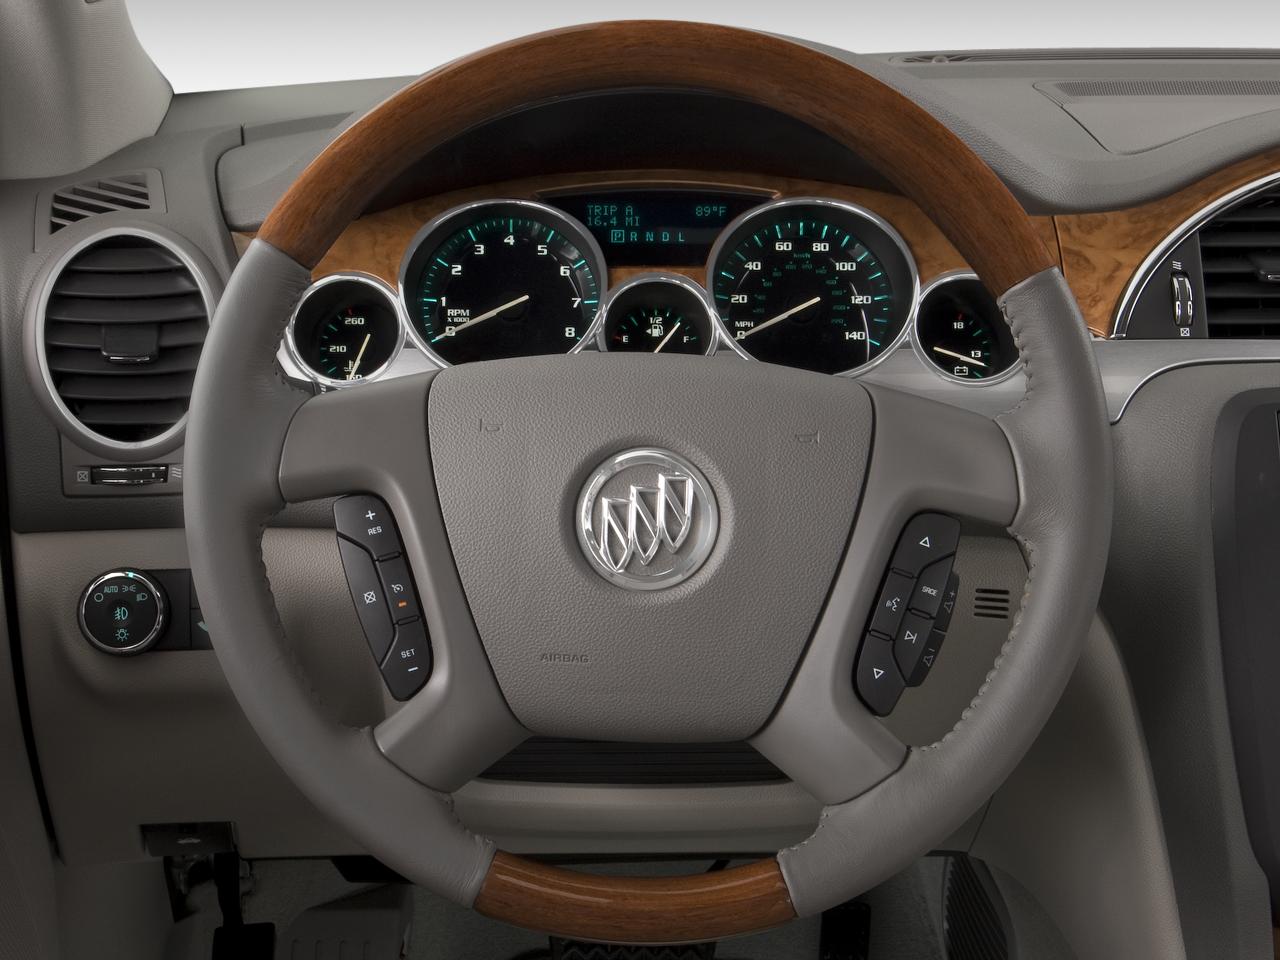 Sneak peek 2013 buick enclave interior - Buick enclave choccachino interior ...